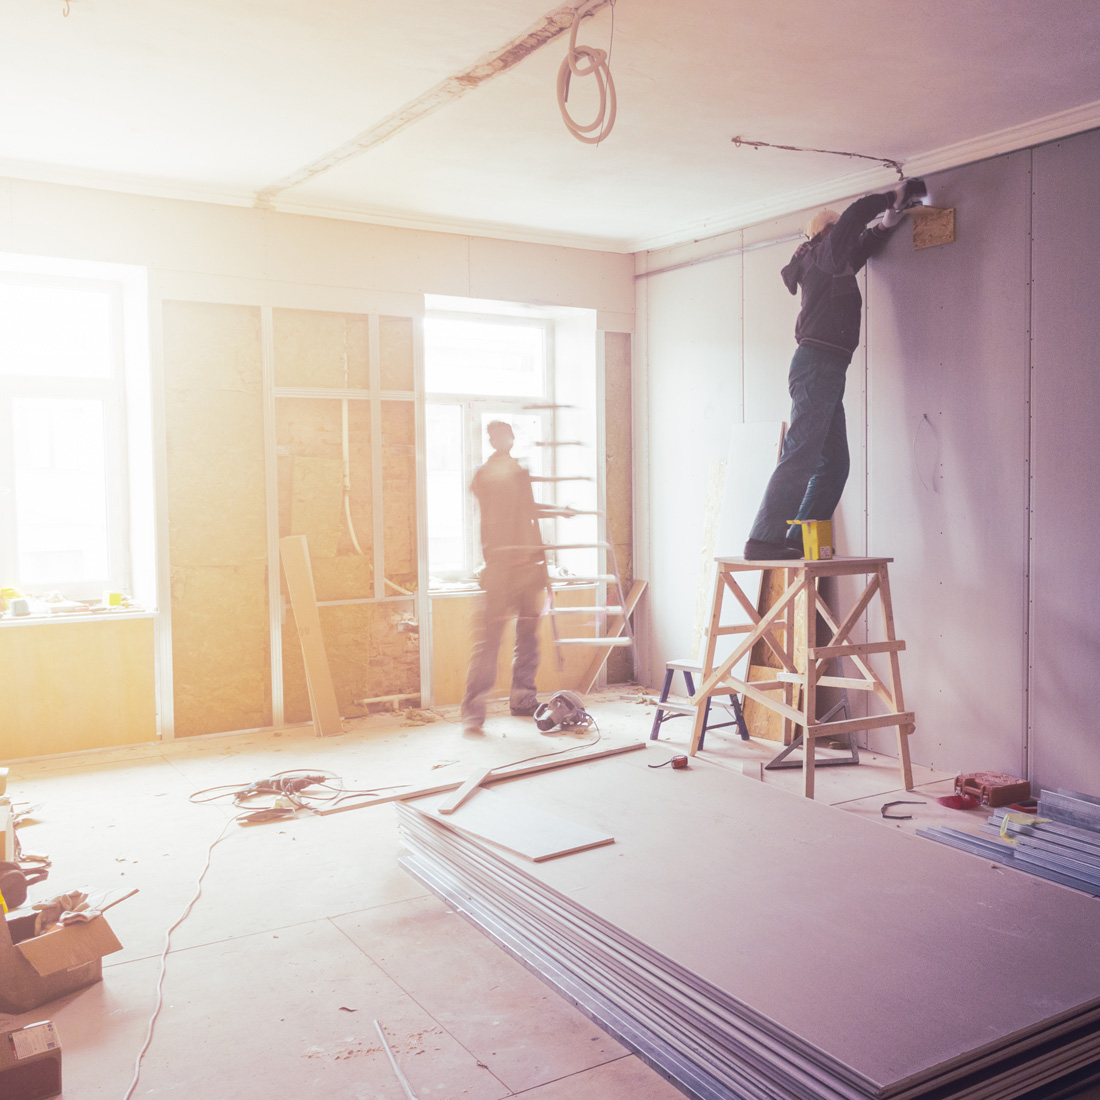 Alto-construction-renovation